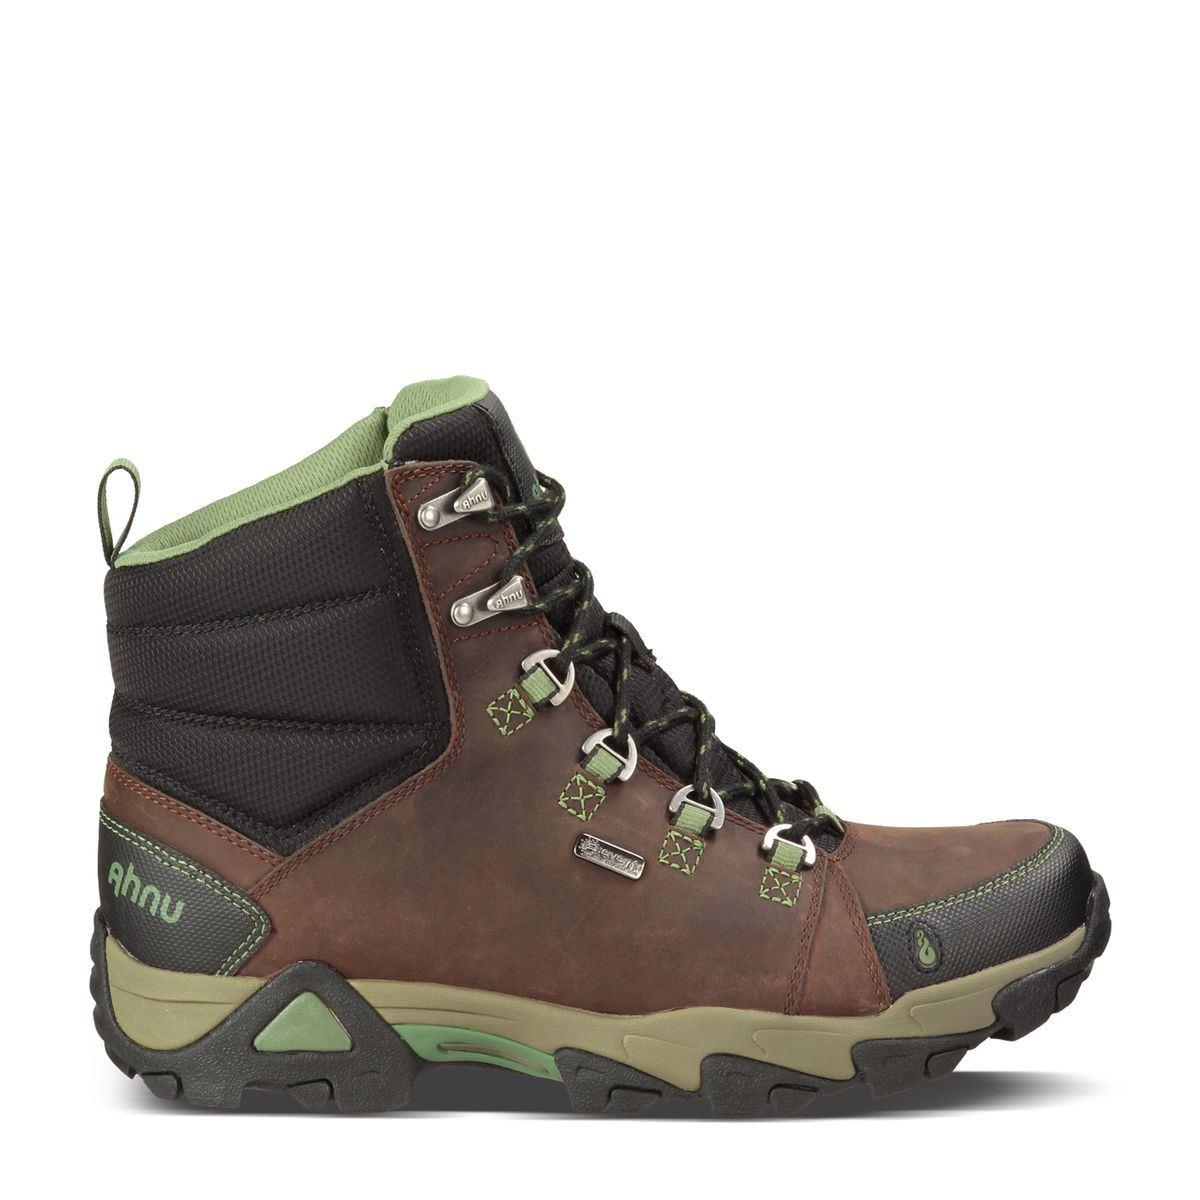 coburn men Buy online or in store: men's coburn low wp by teva by teva at schuler shoes.